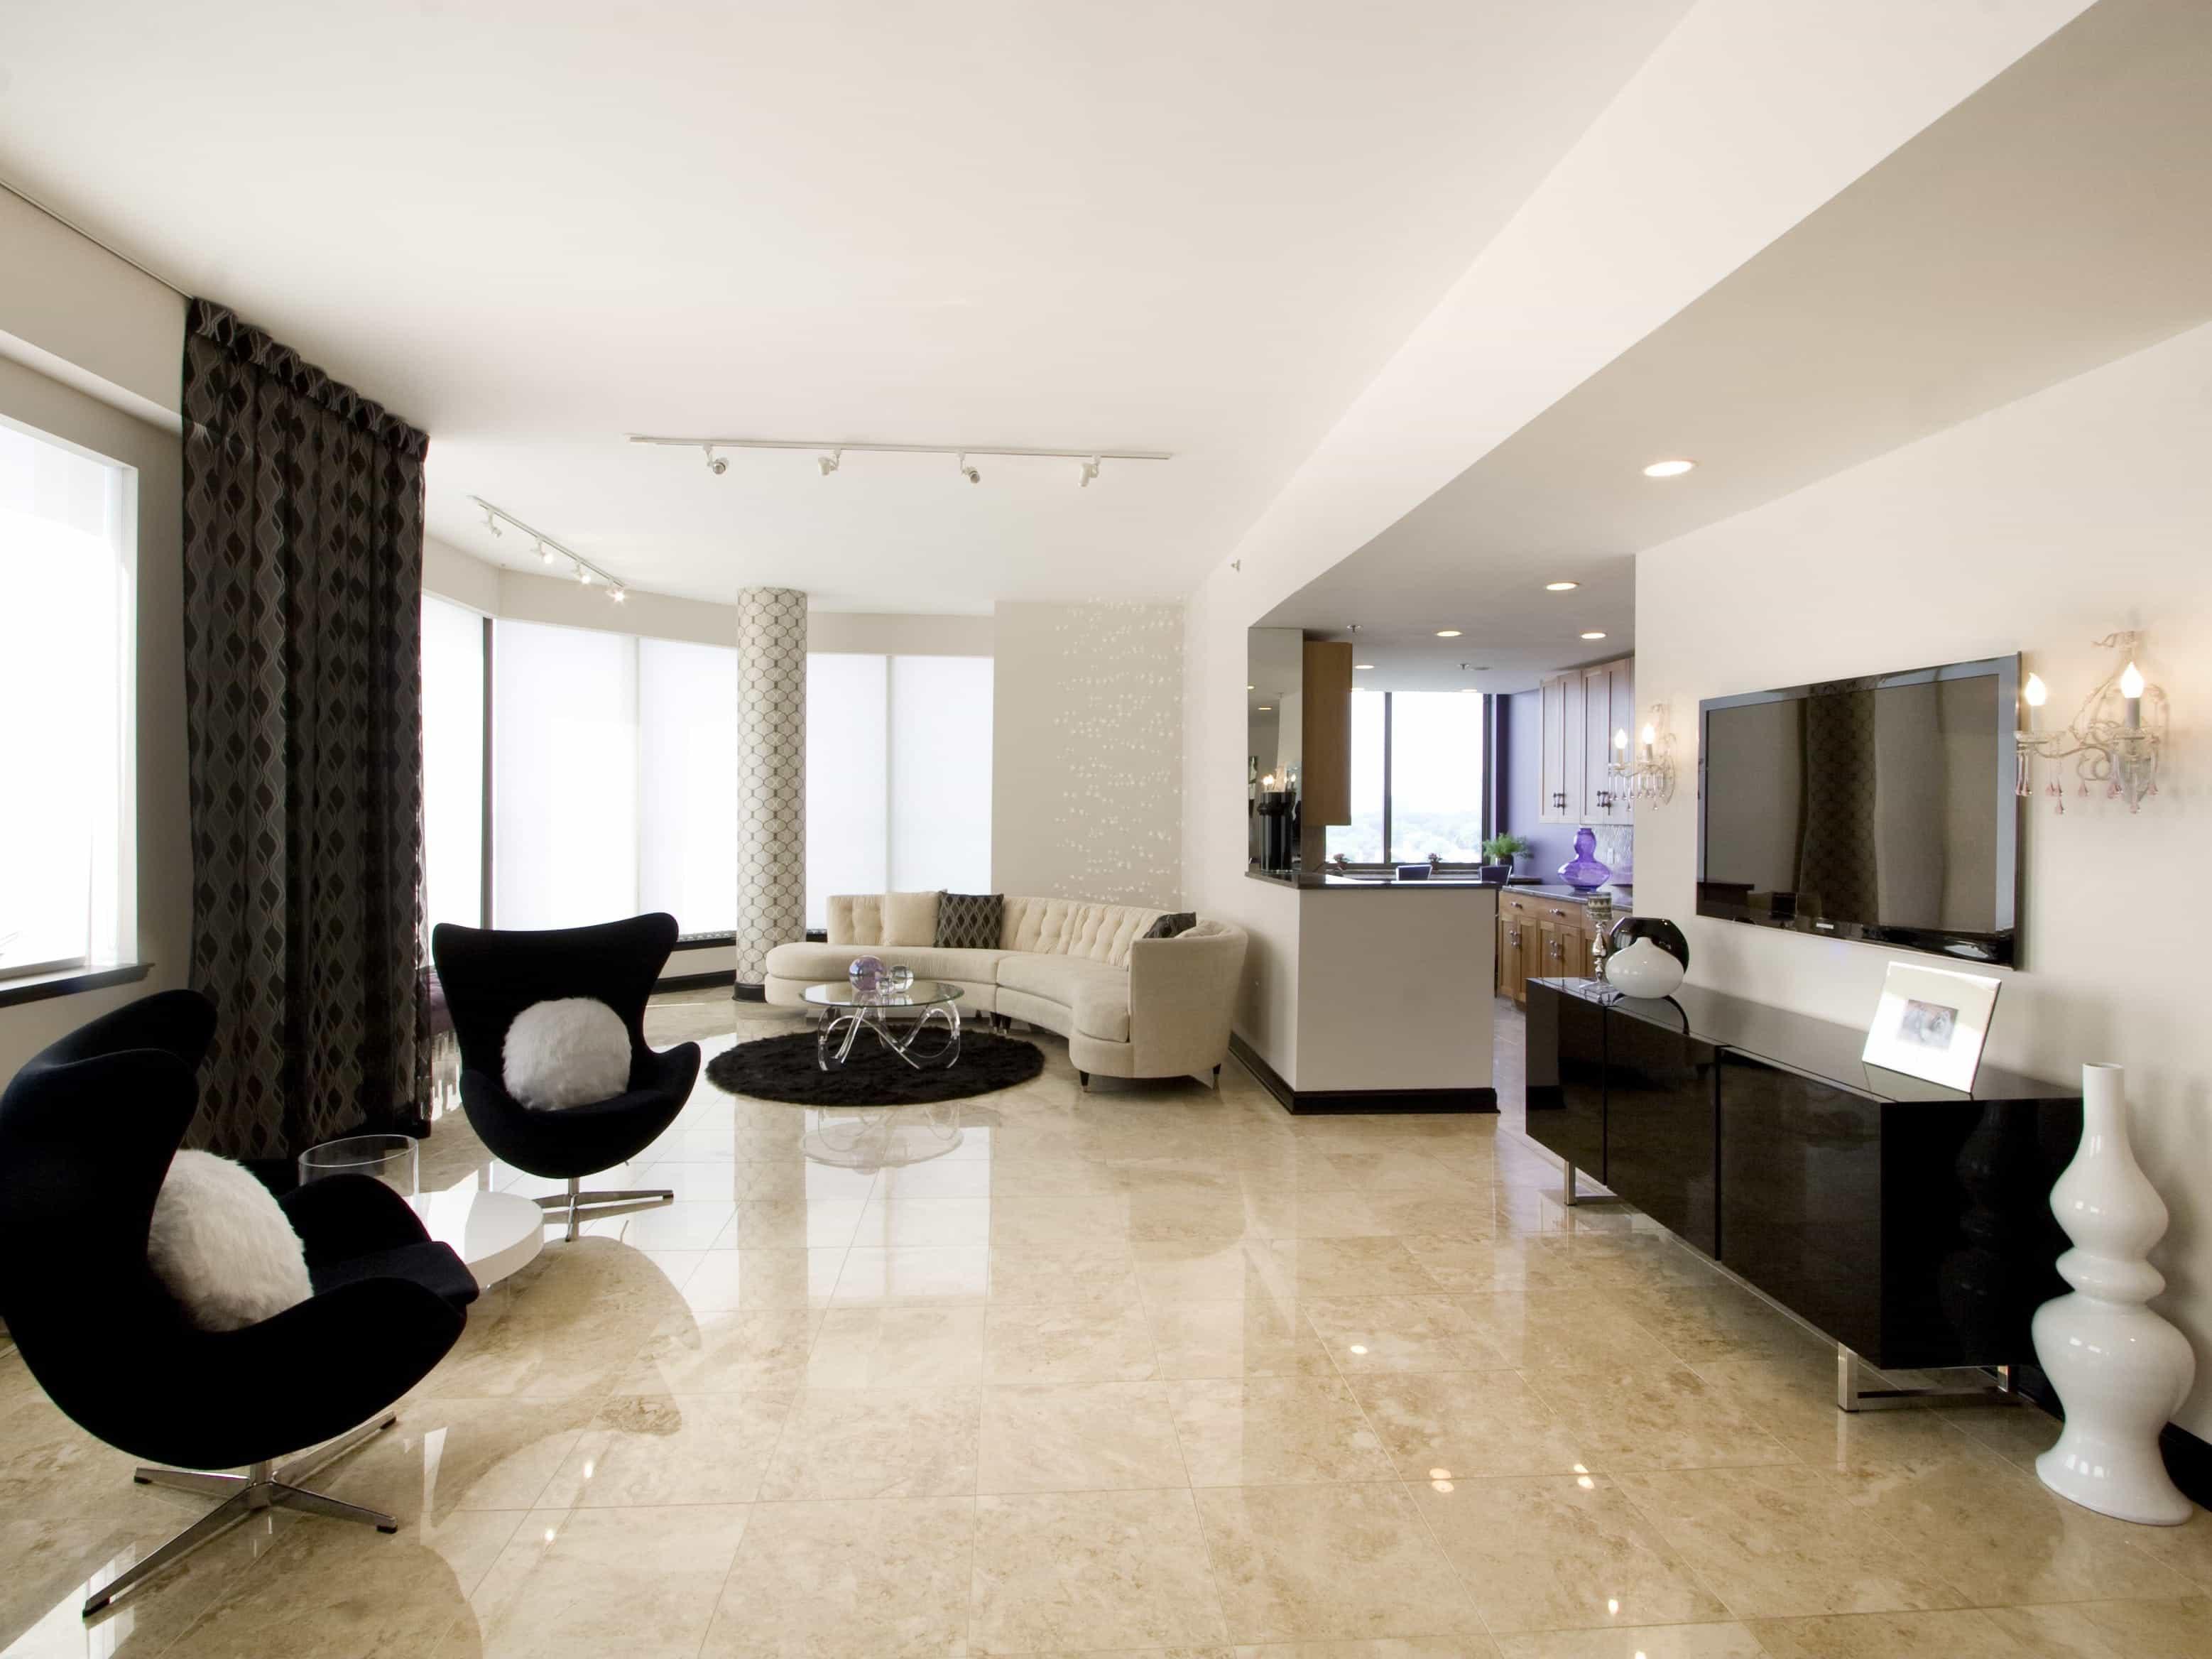 Elegance Modern Living Room With Brown Marble Flooring (Image 4 of 13)